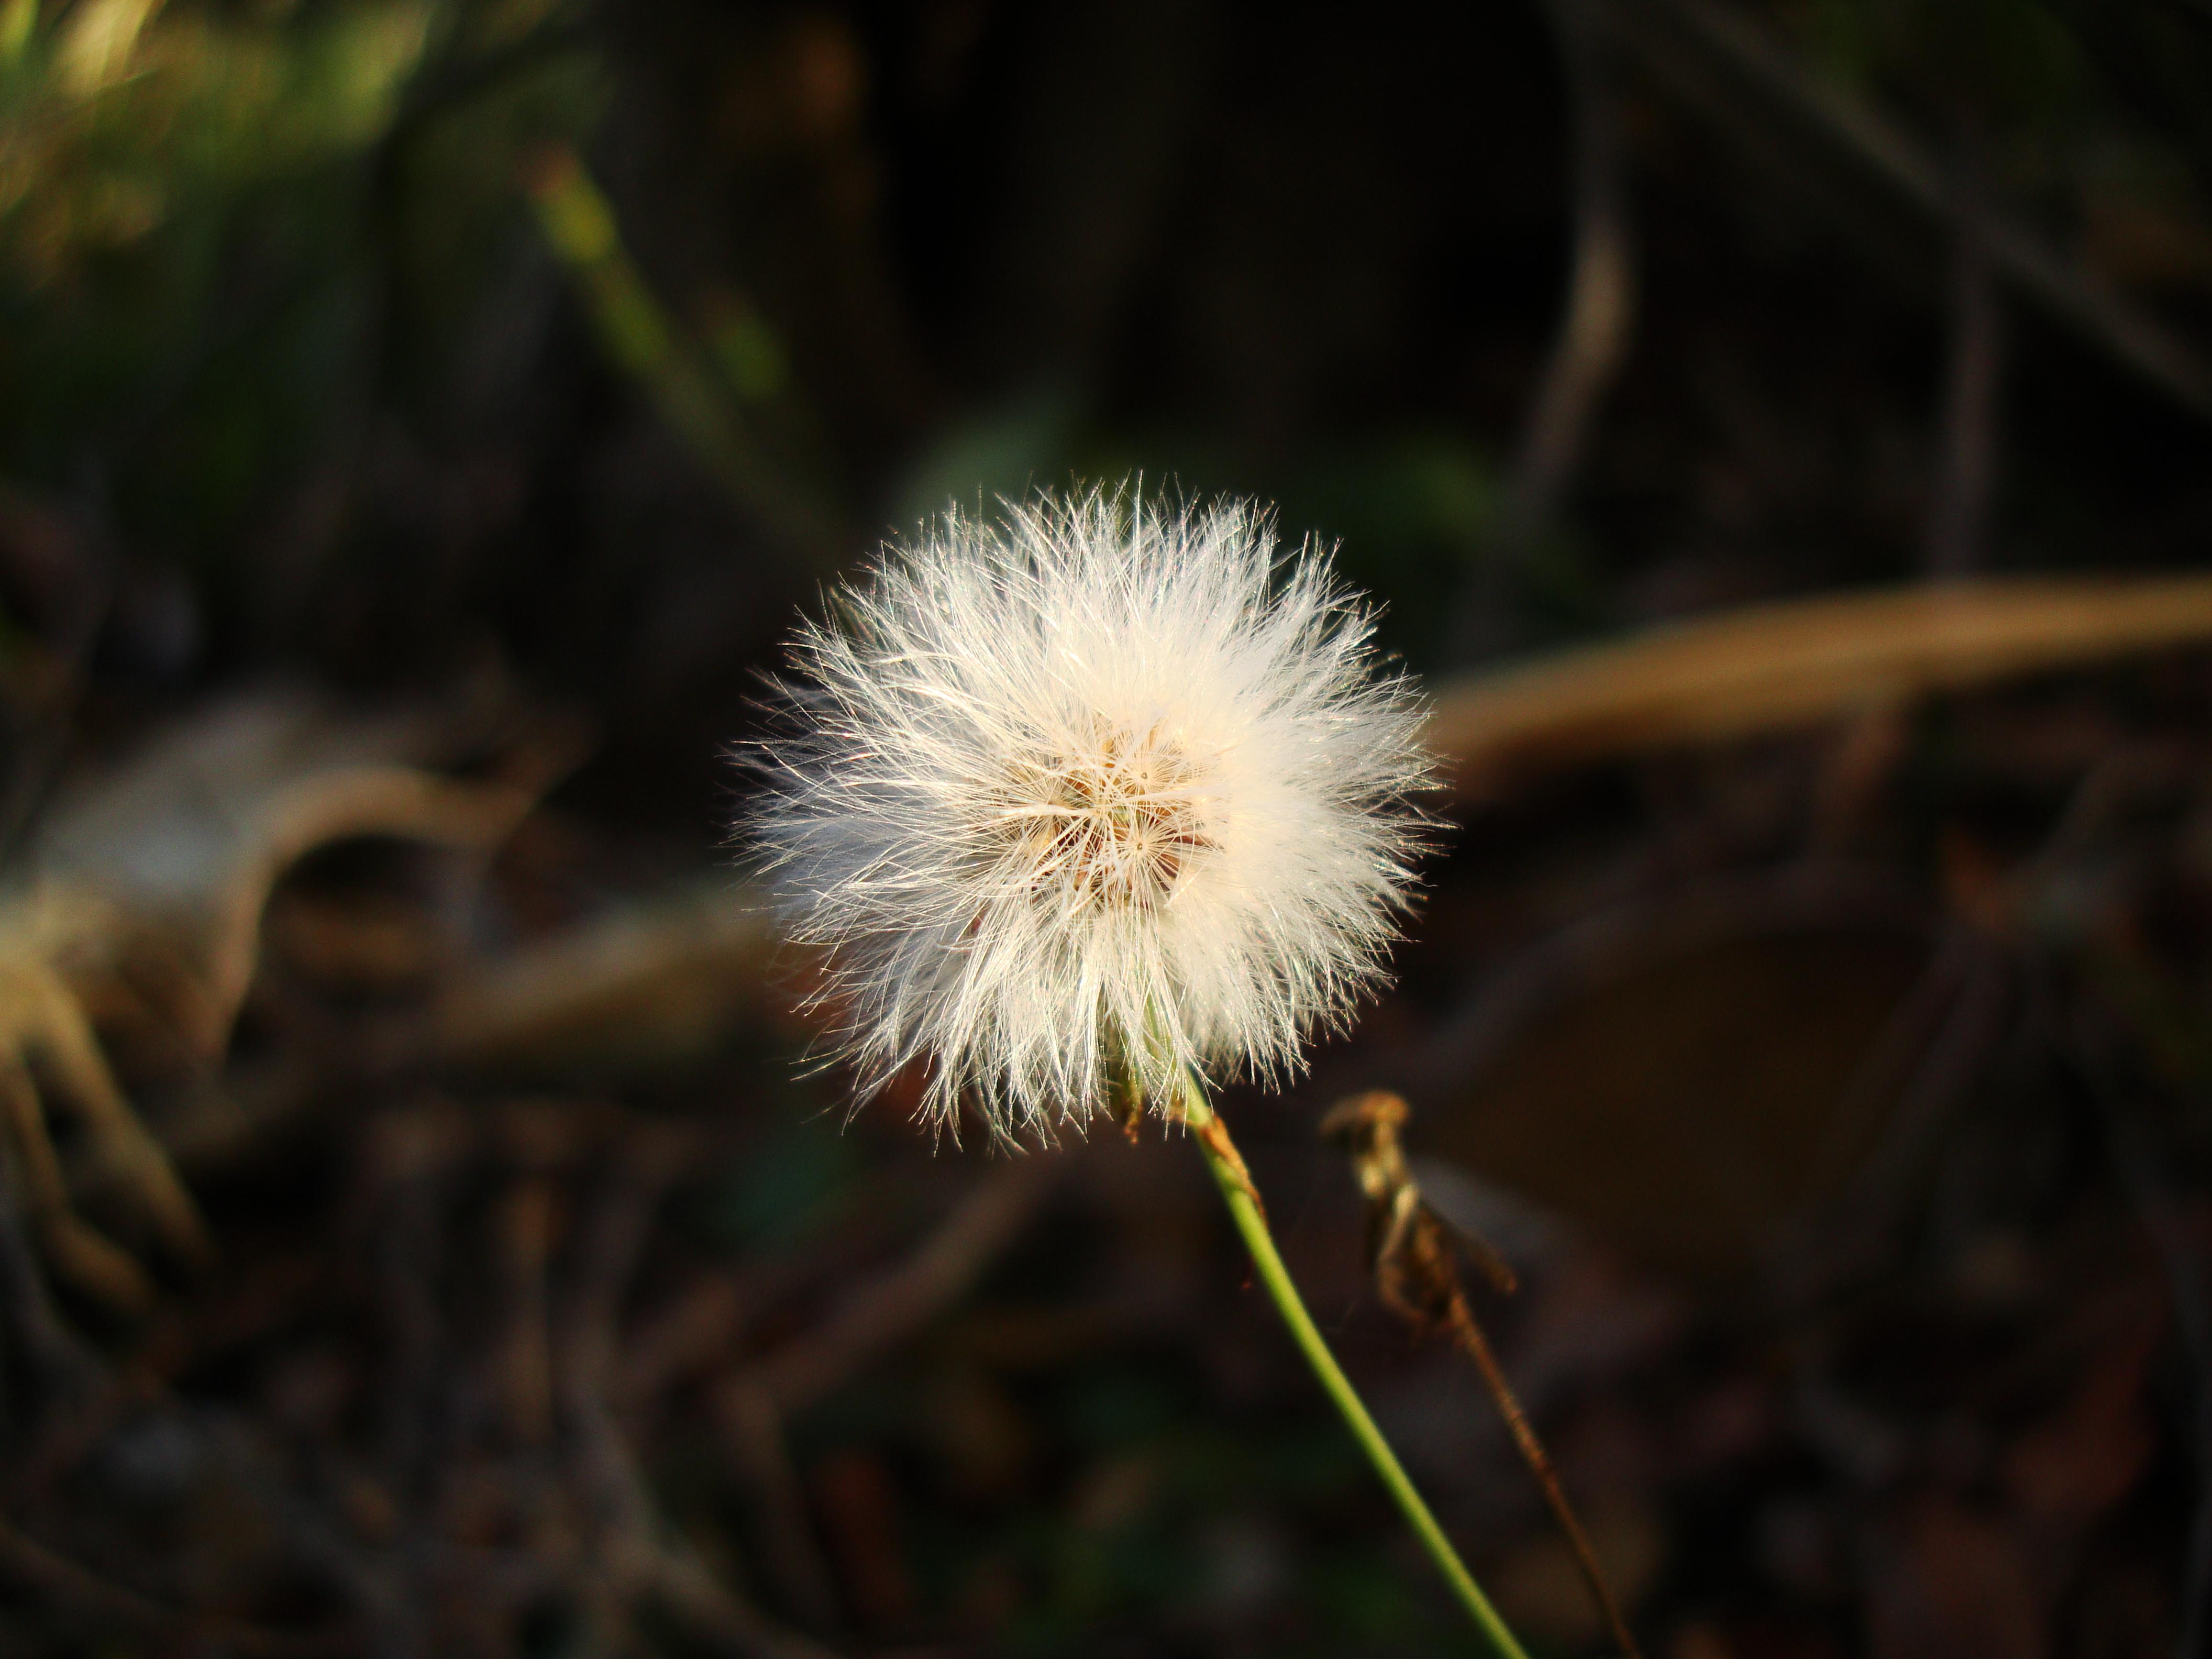 Tiny Flowers Daisy seeds Noosa Australia 04